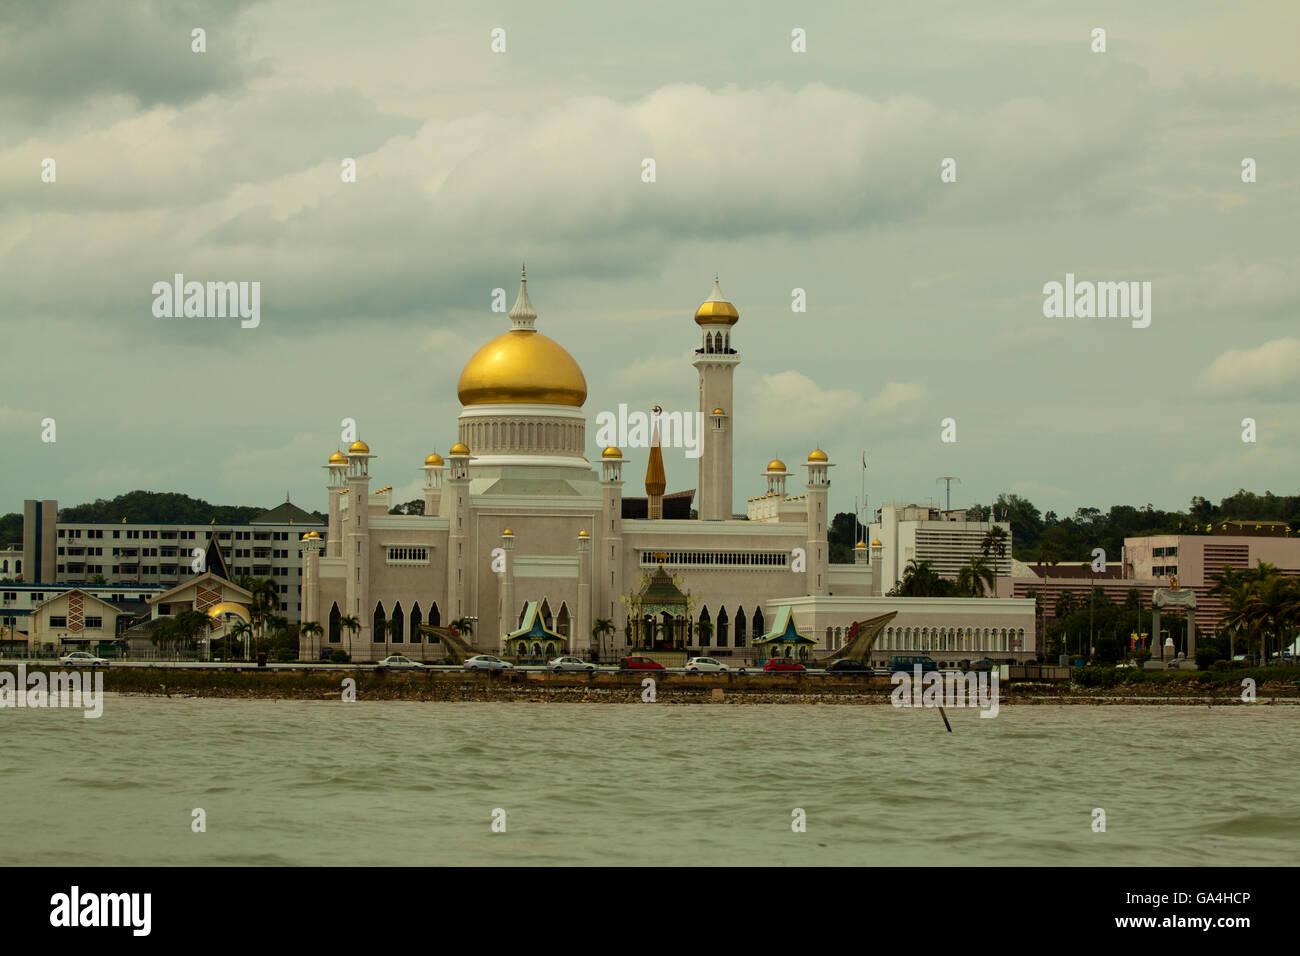 Beautiful View of Sultan Omar Ali Saifudding Mosque, Bandar Seri Begawan, Brunei - Stock Image